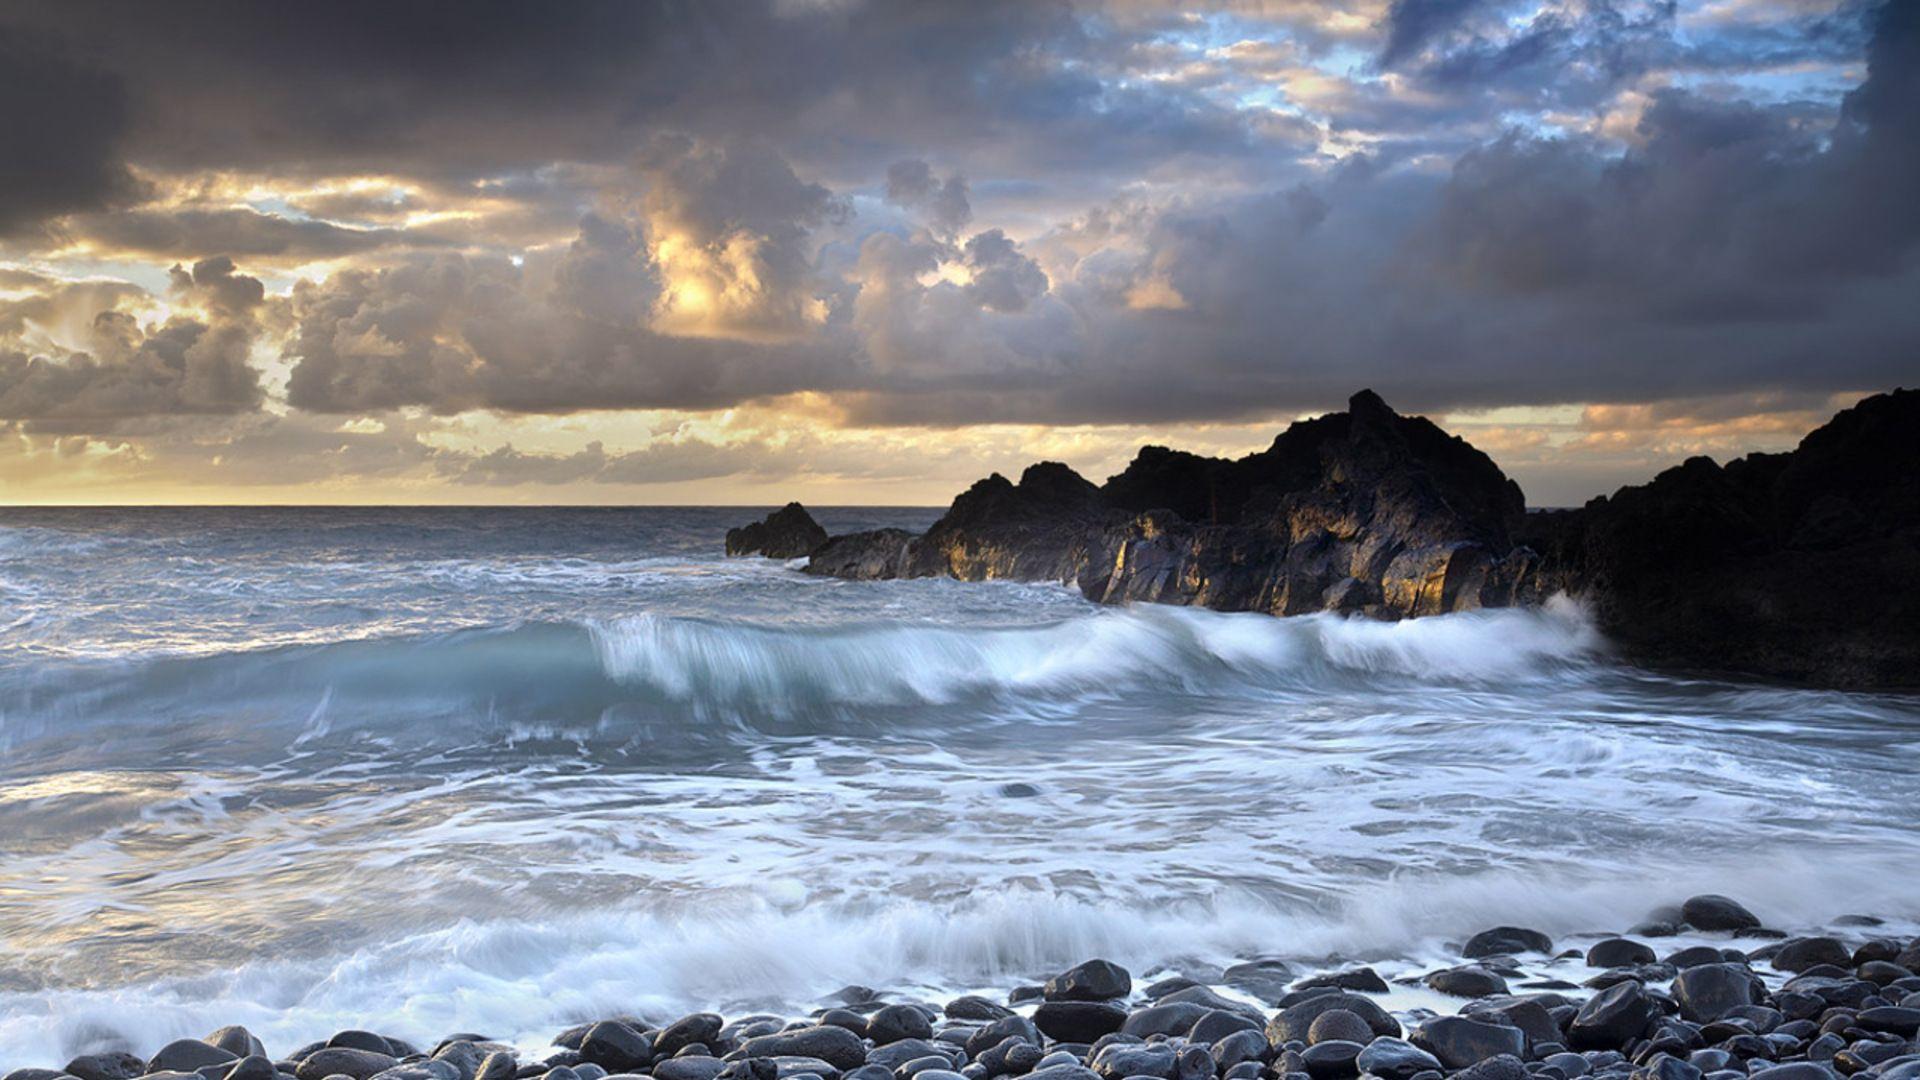 Sea Waves On Stony Shore Hd Desktop Background HD wallpapers 1920x1080